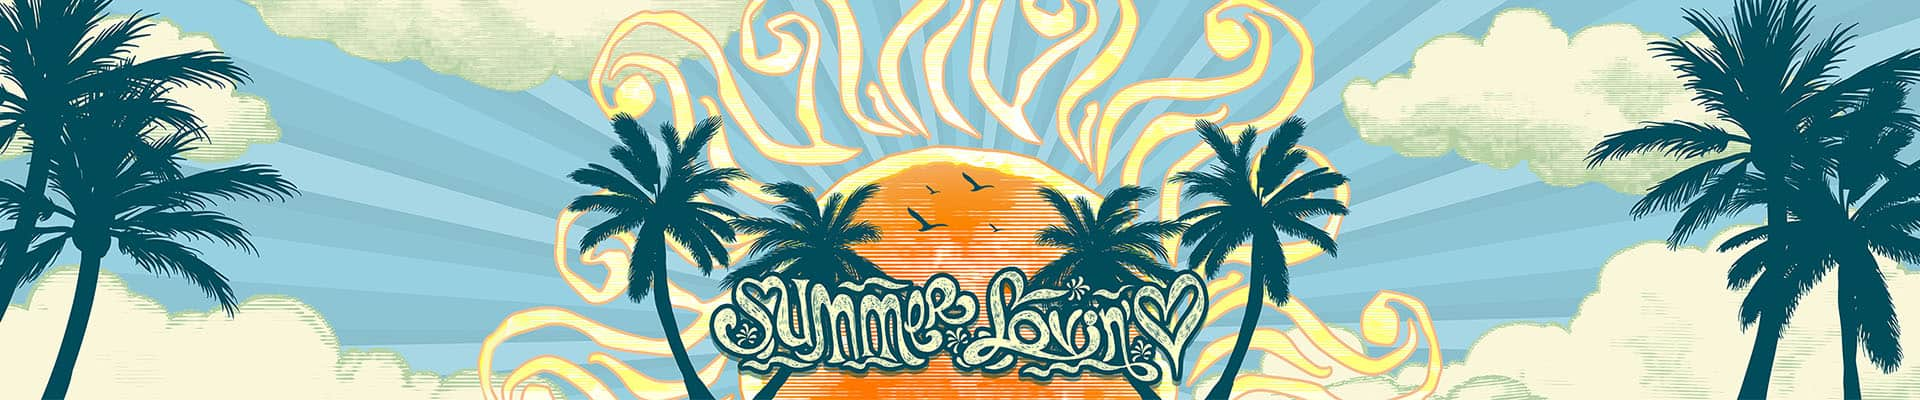 Summer Lovin - Church Series